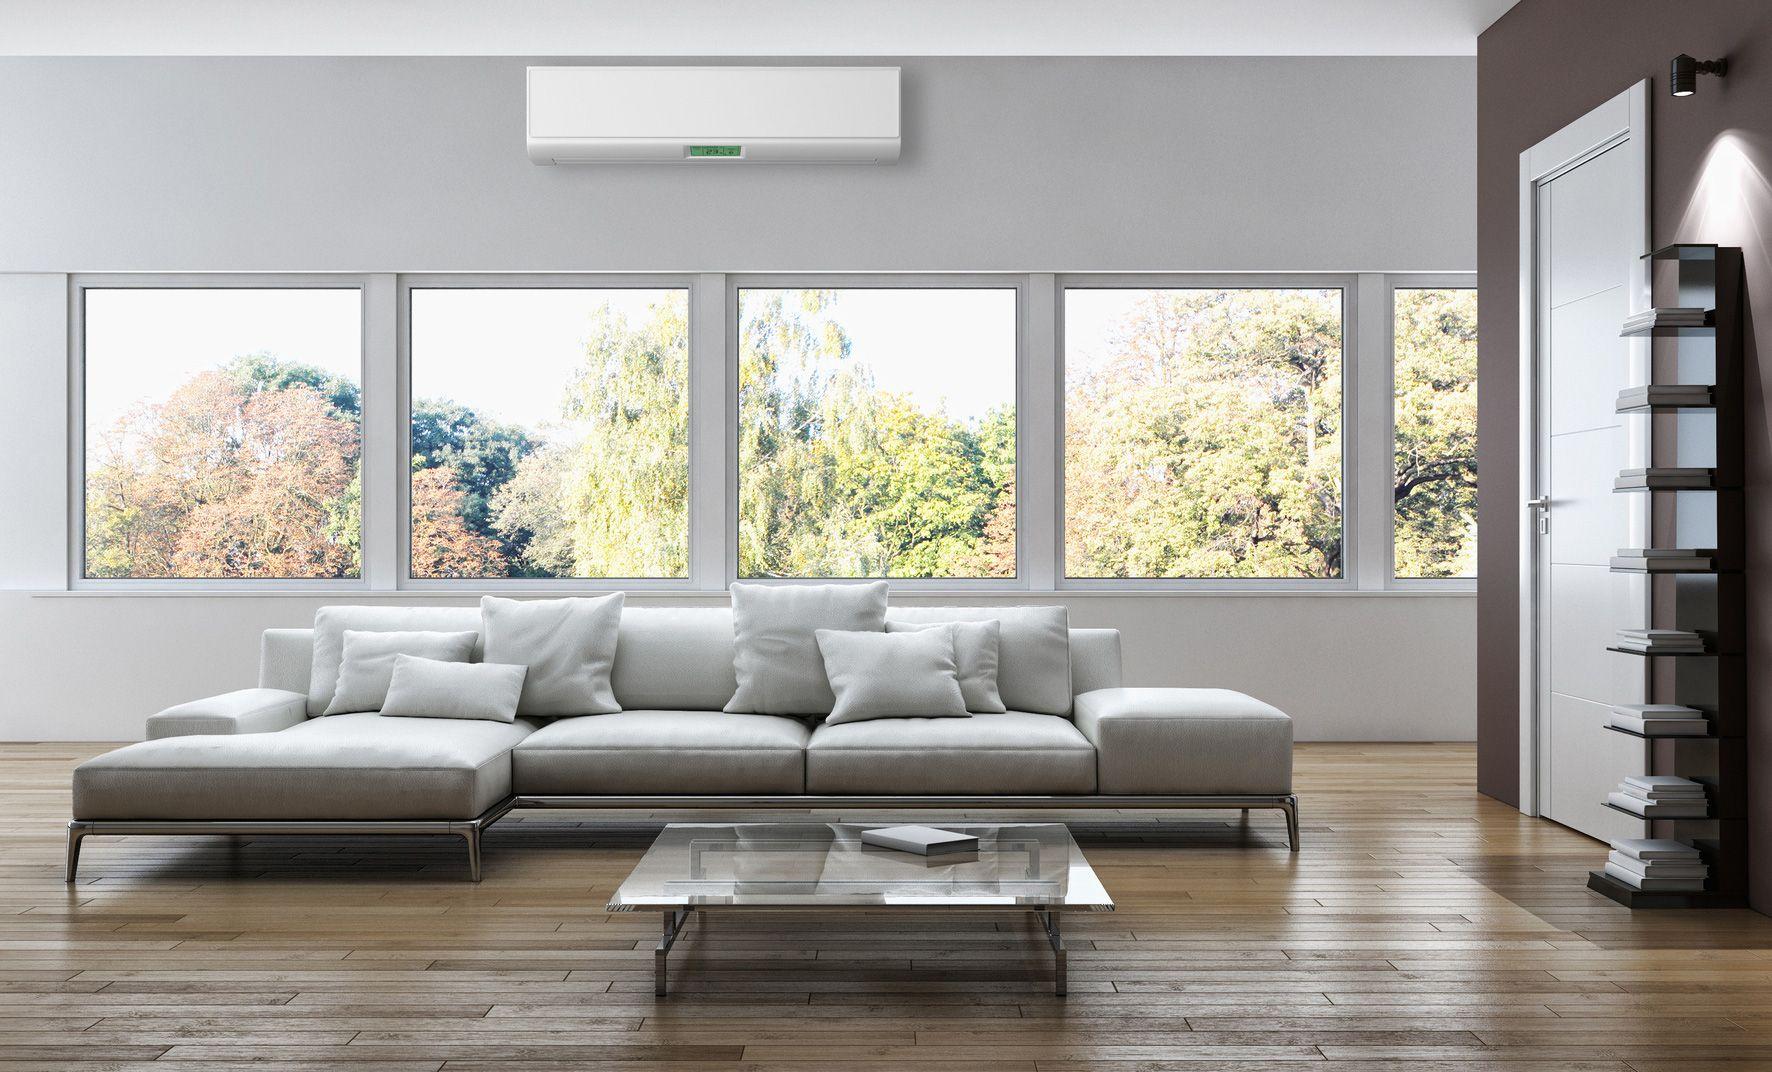 Homes Comfort Family HeatingandAir Home, Sectional